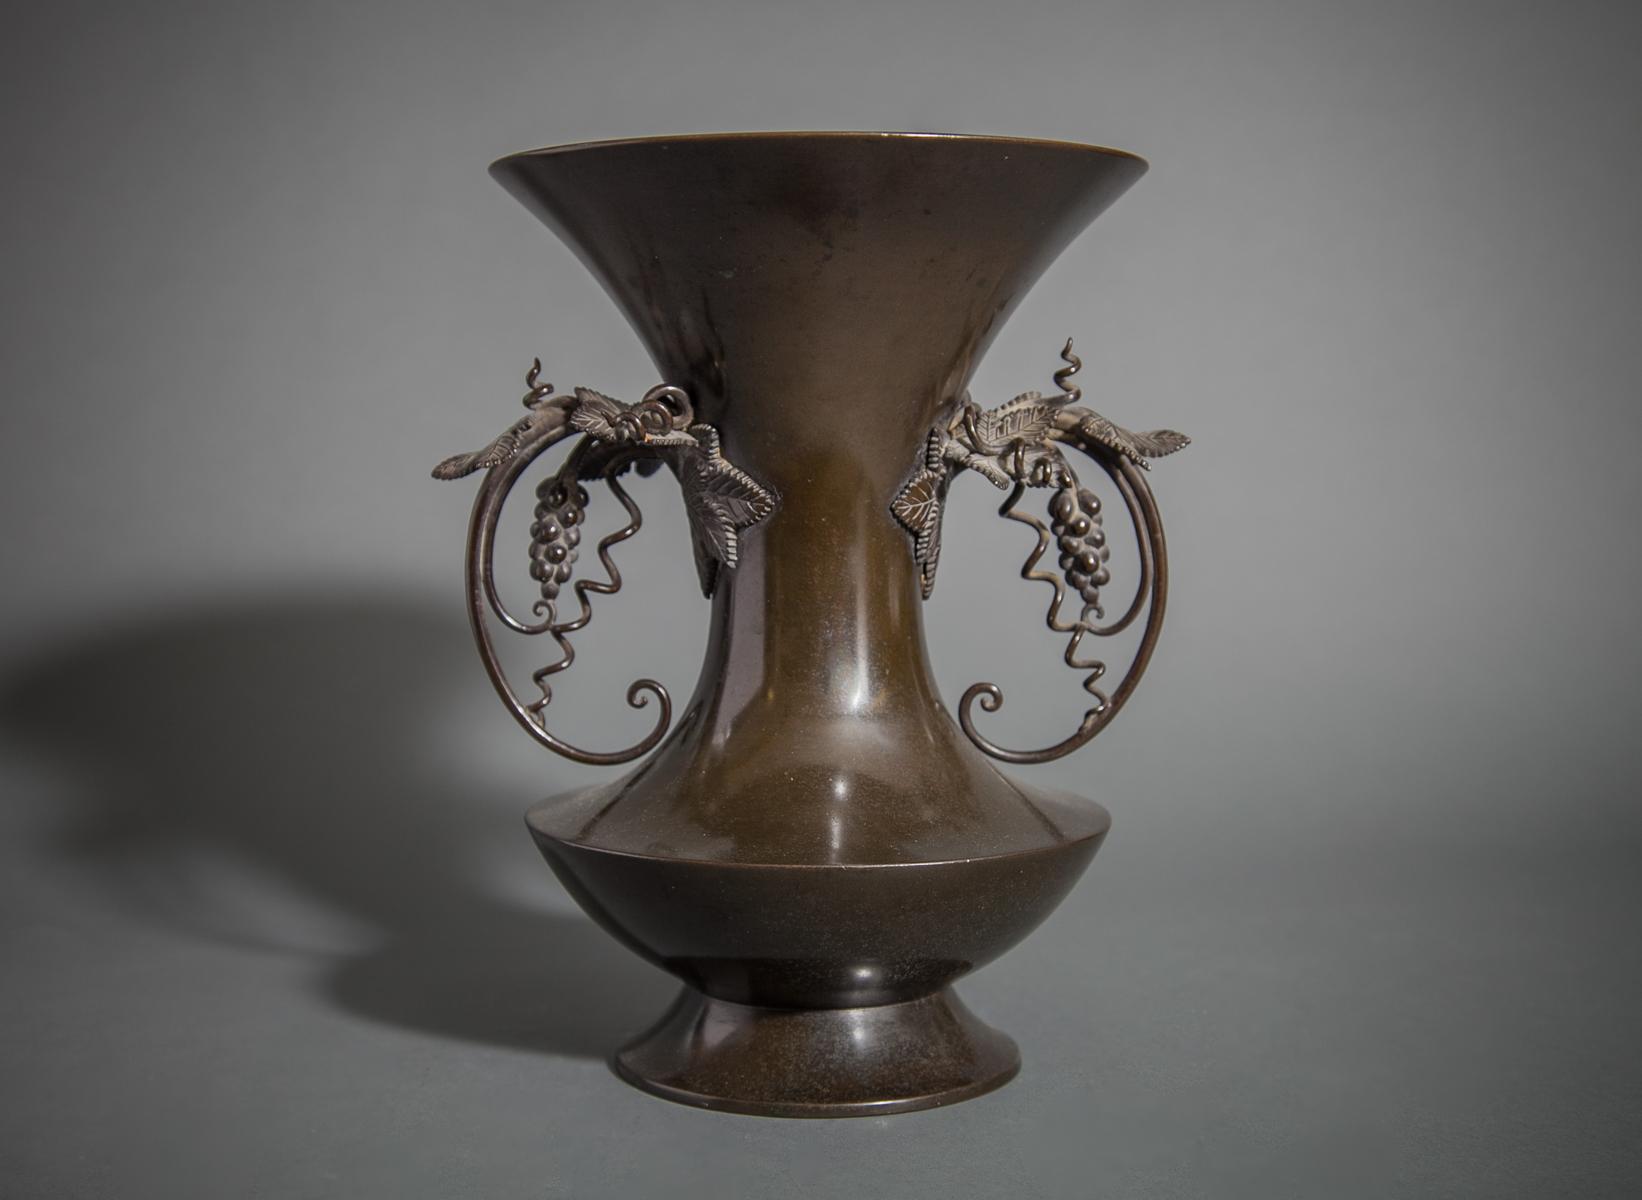 19th Century Superior Quality Japanese Bronze Vase With Grape Vine Handles